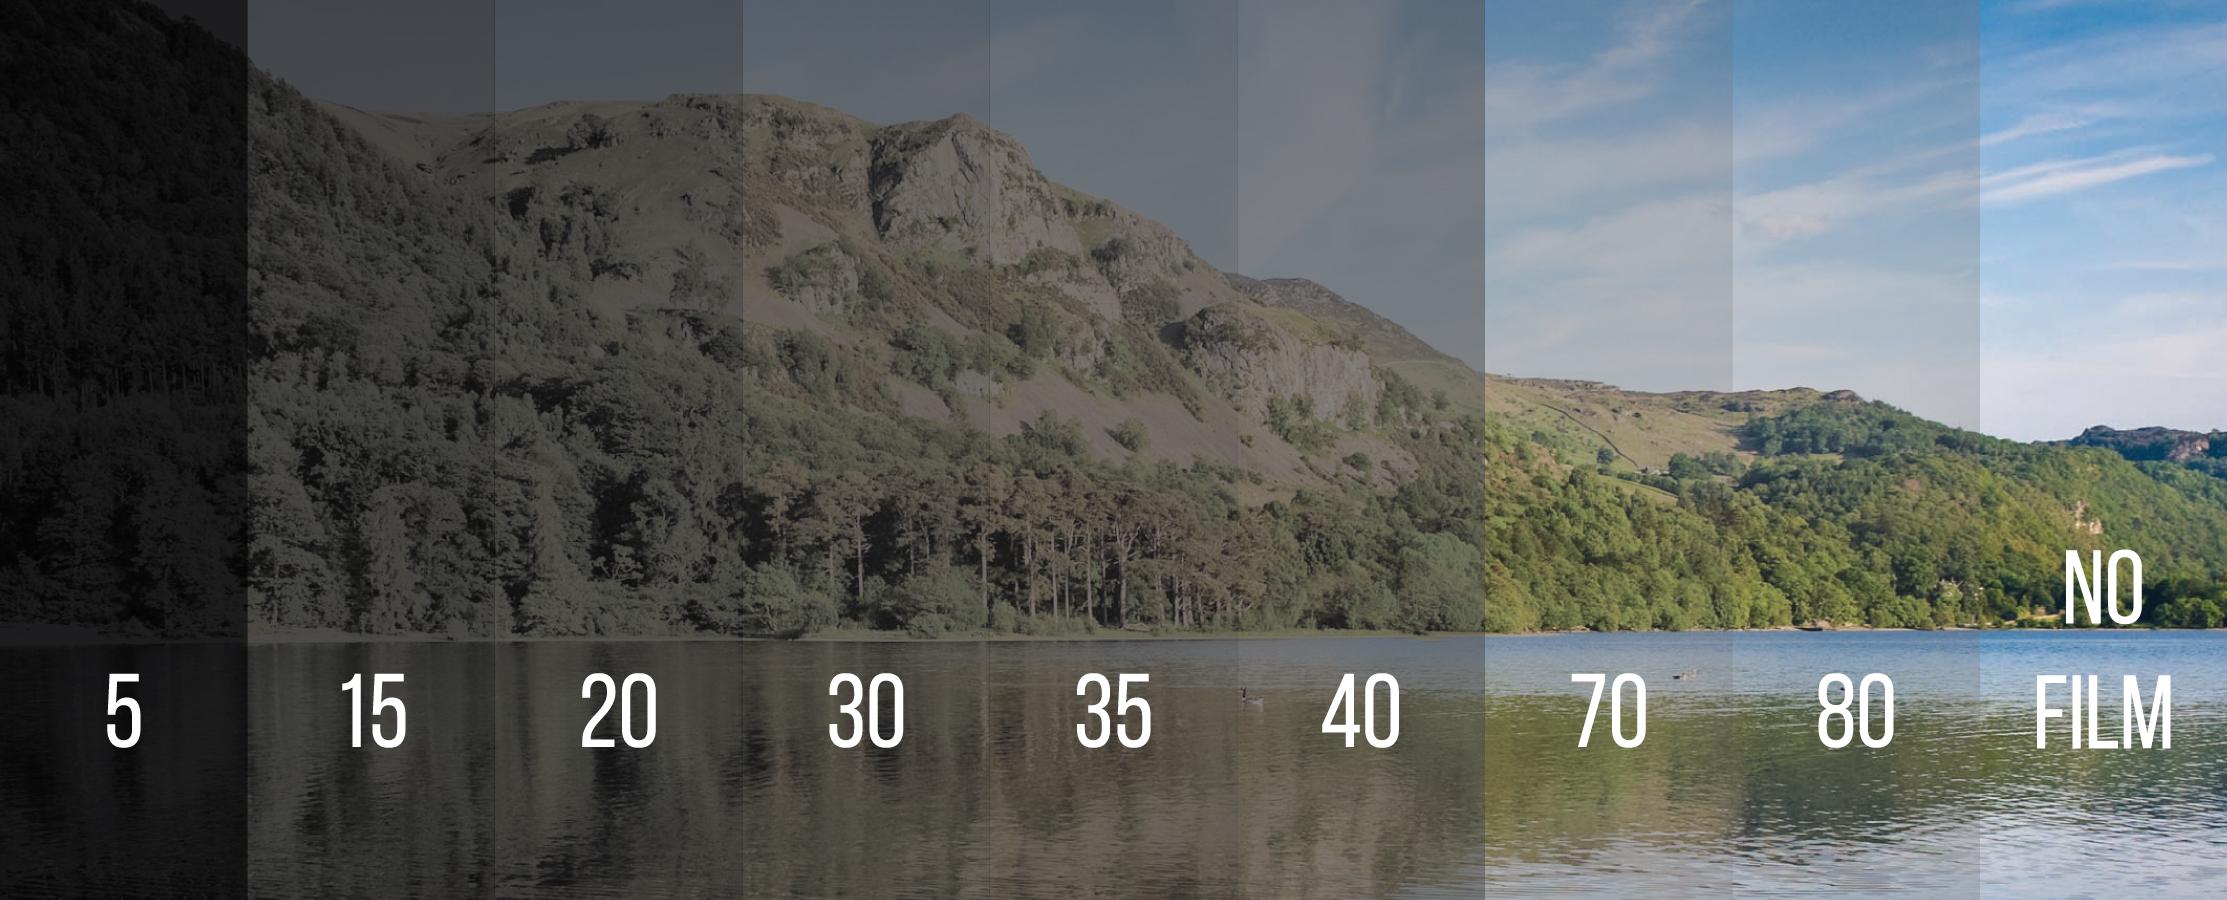 Film_Shade_Scale.jpg